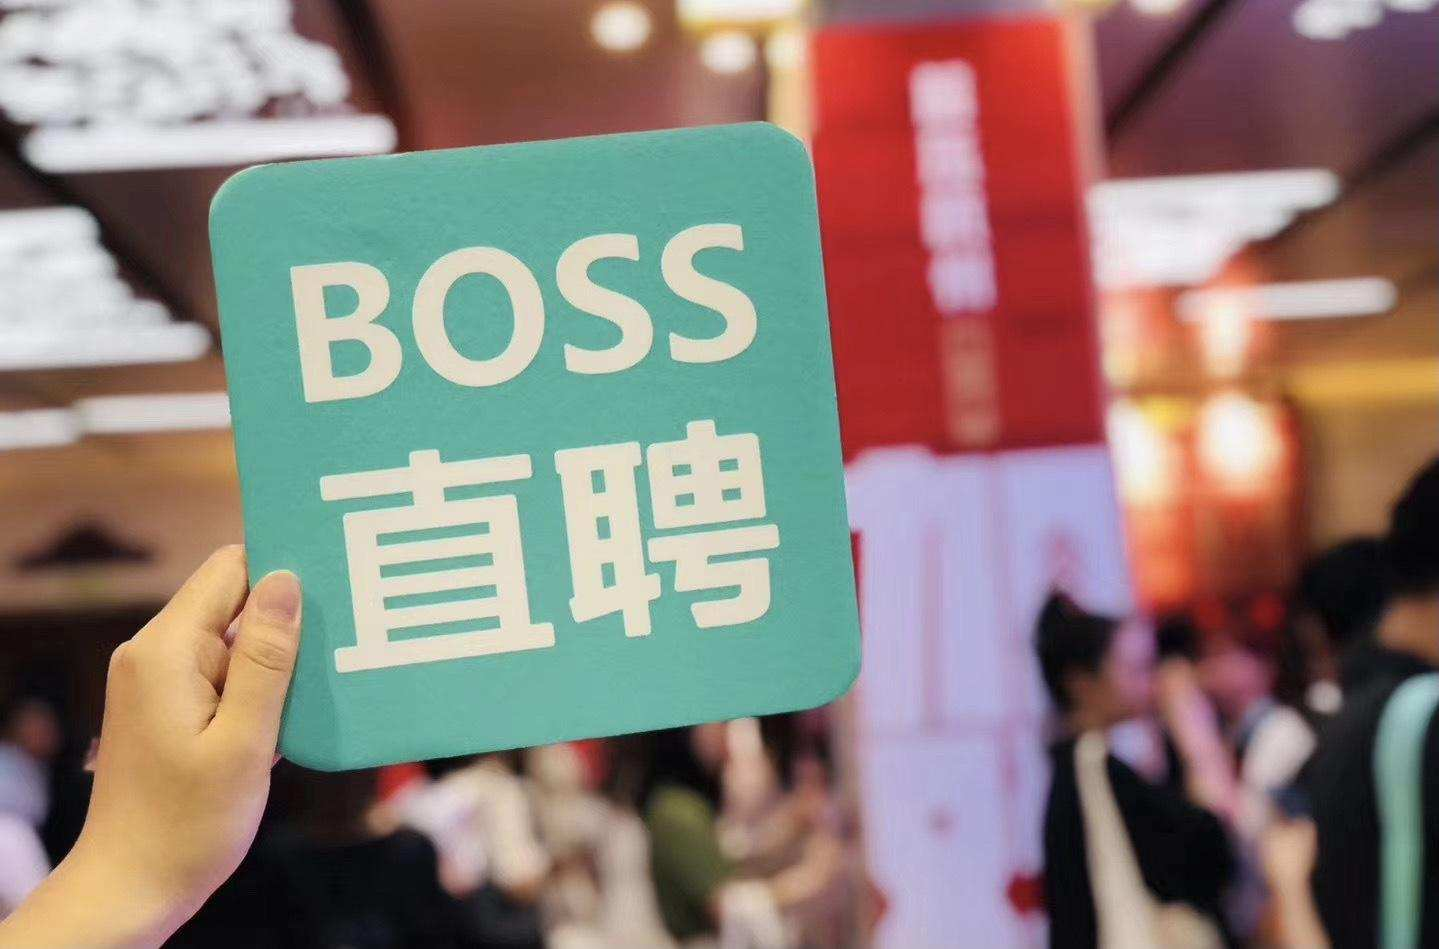 BOSS直聘赴美上市,找工作跟老板谈能帮BOSS直聘走多远?